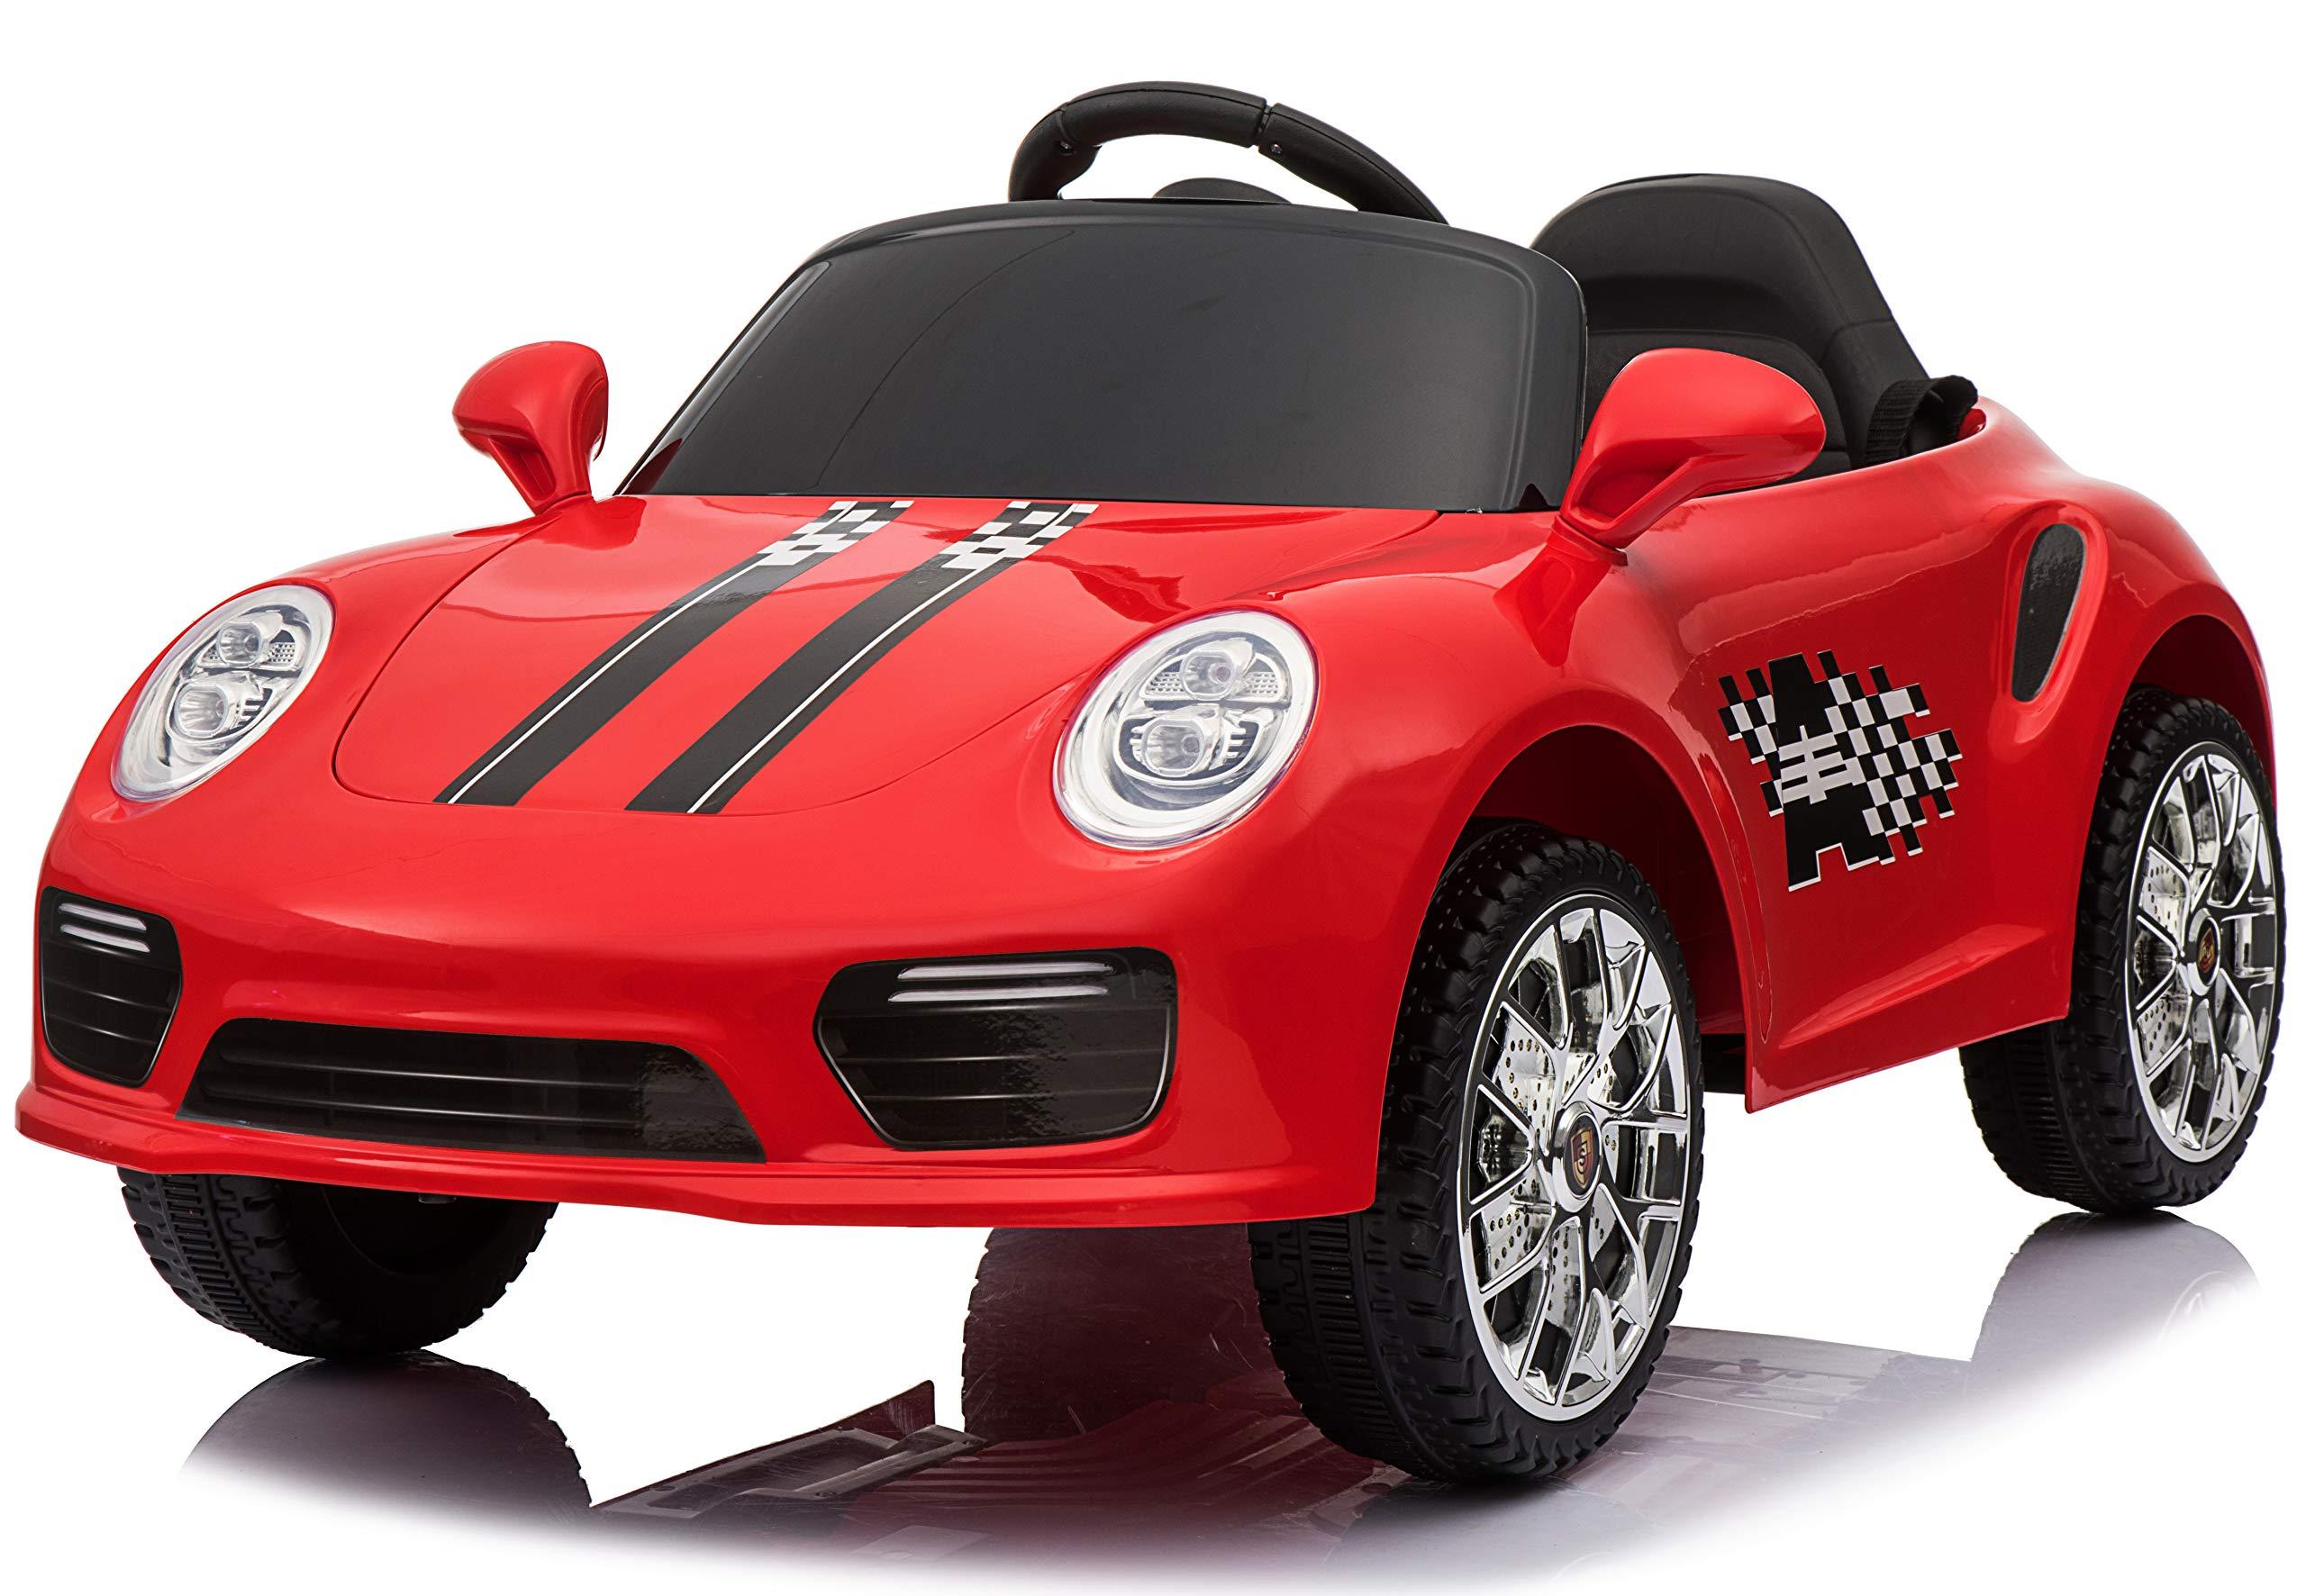 Coche Juguete Electrico Para Ninos Paseo Carro Suv Mp3 Music Remoto